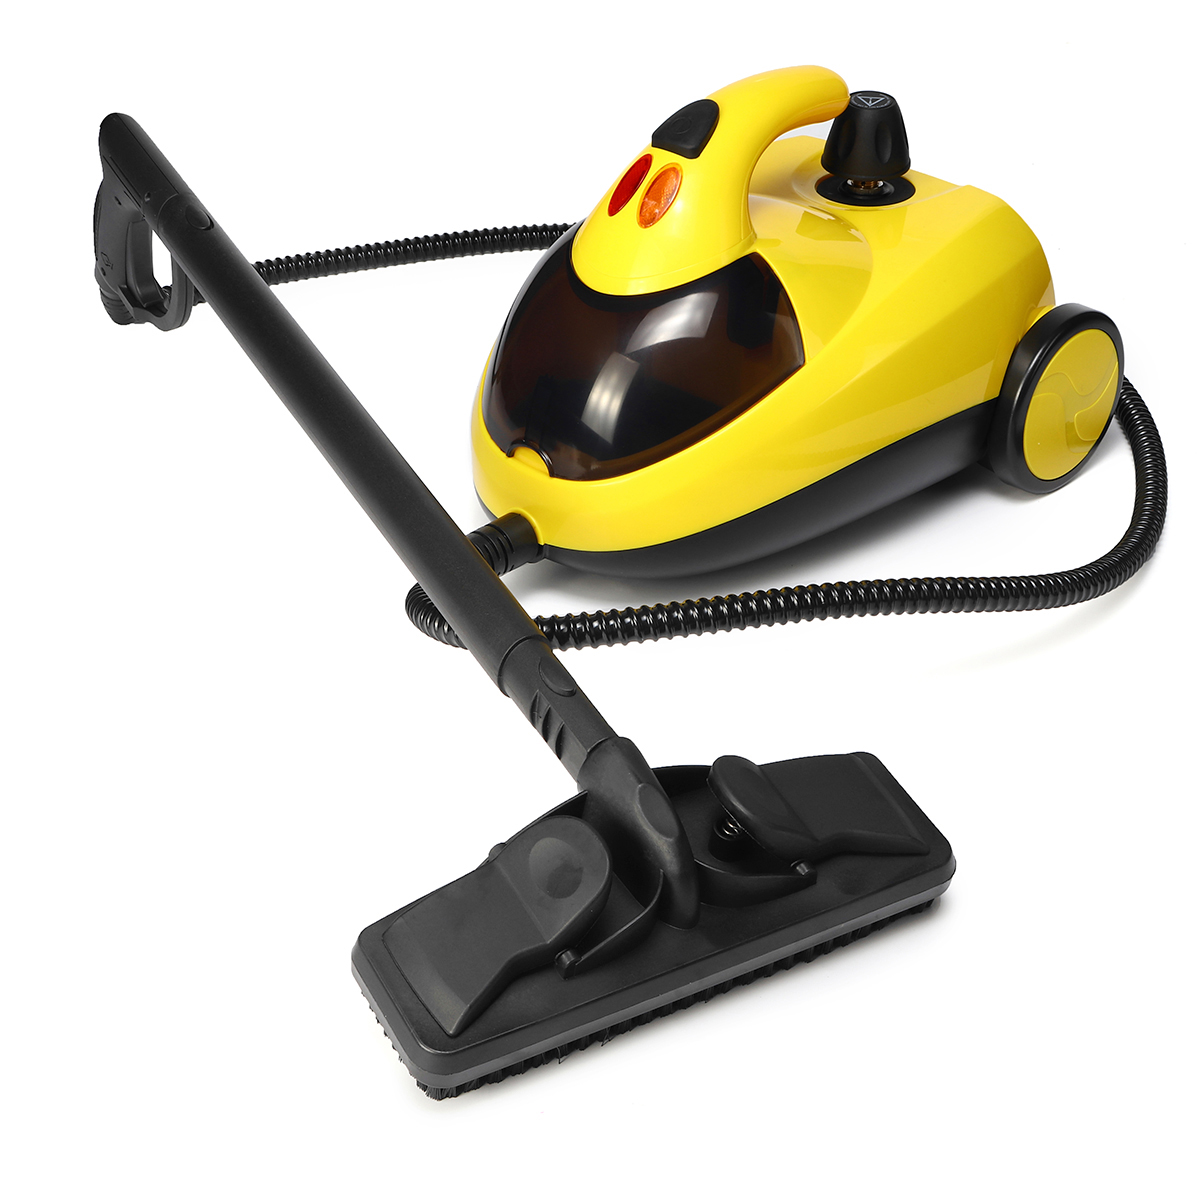 13in1 AU220V 1.5L4.0 1800W Bar High Pressure Steam Floor Carpet Cleaner Washer Cleaning Machine 360 Wheel for Clean Bathroom Car